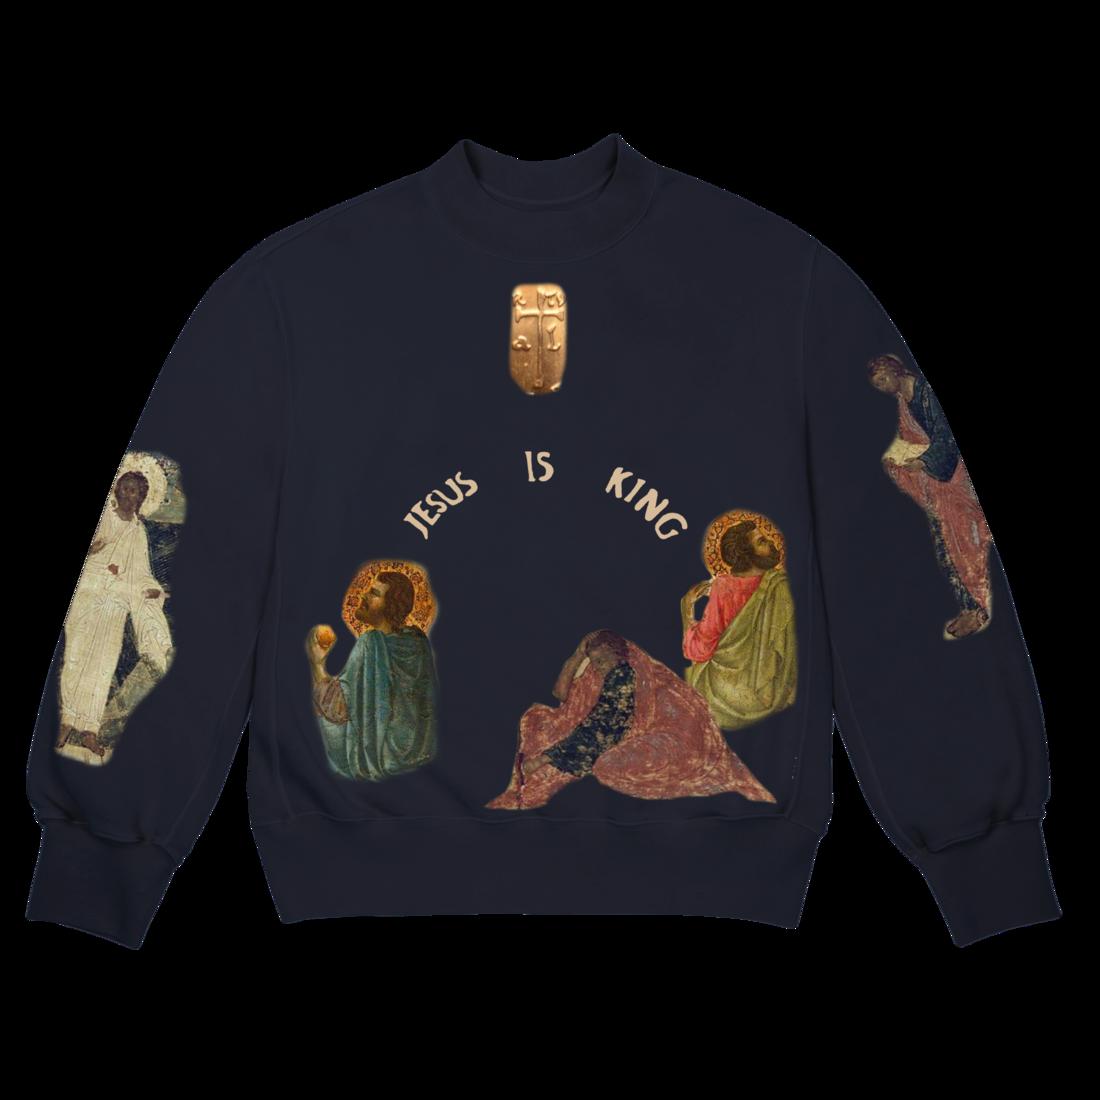 Jesus Is King Cross Crewneck Ii Kanye West Kanye West Store Kanye West La Outfits